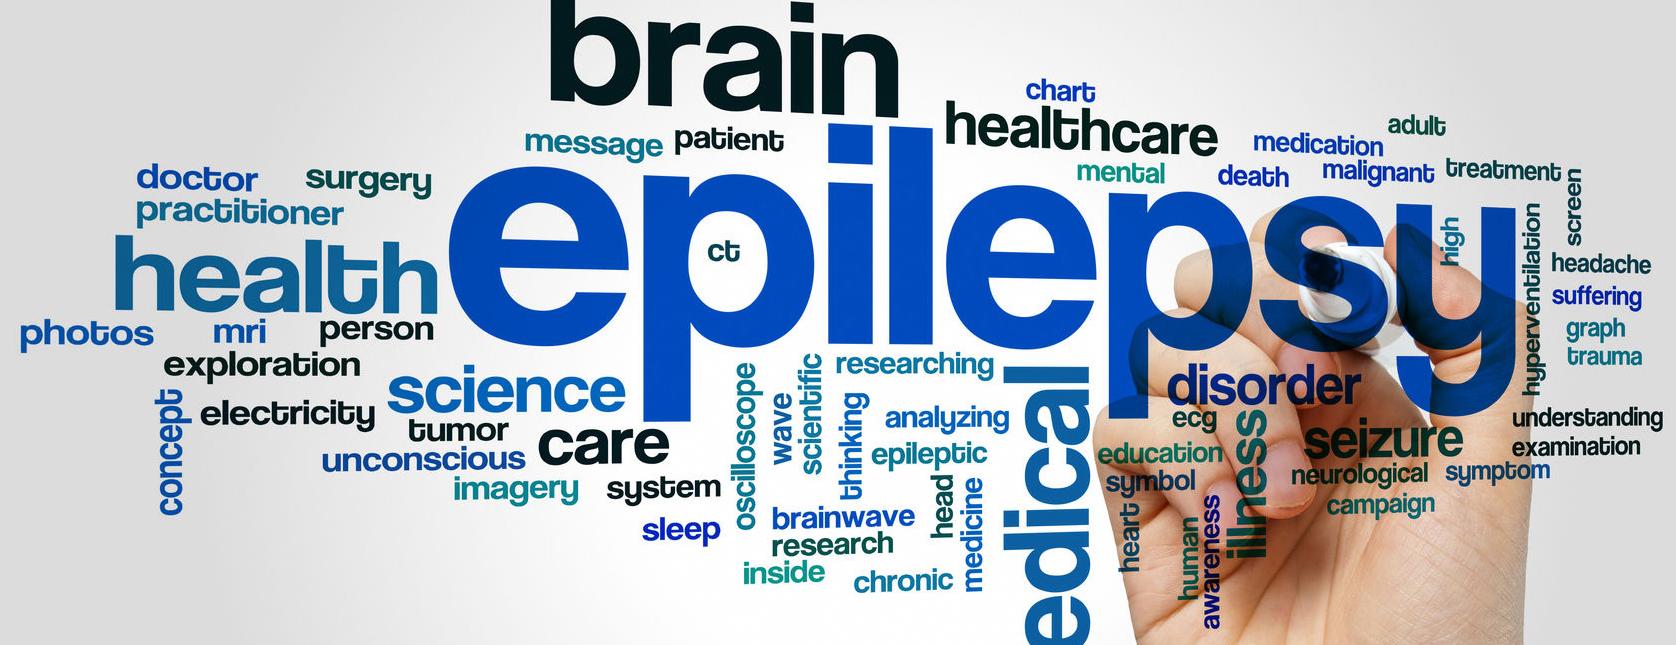 Permalink to:Epilepsy Awareness